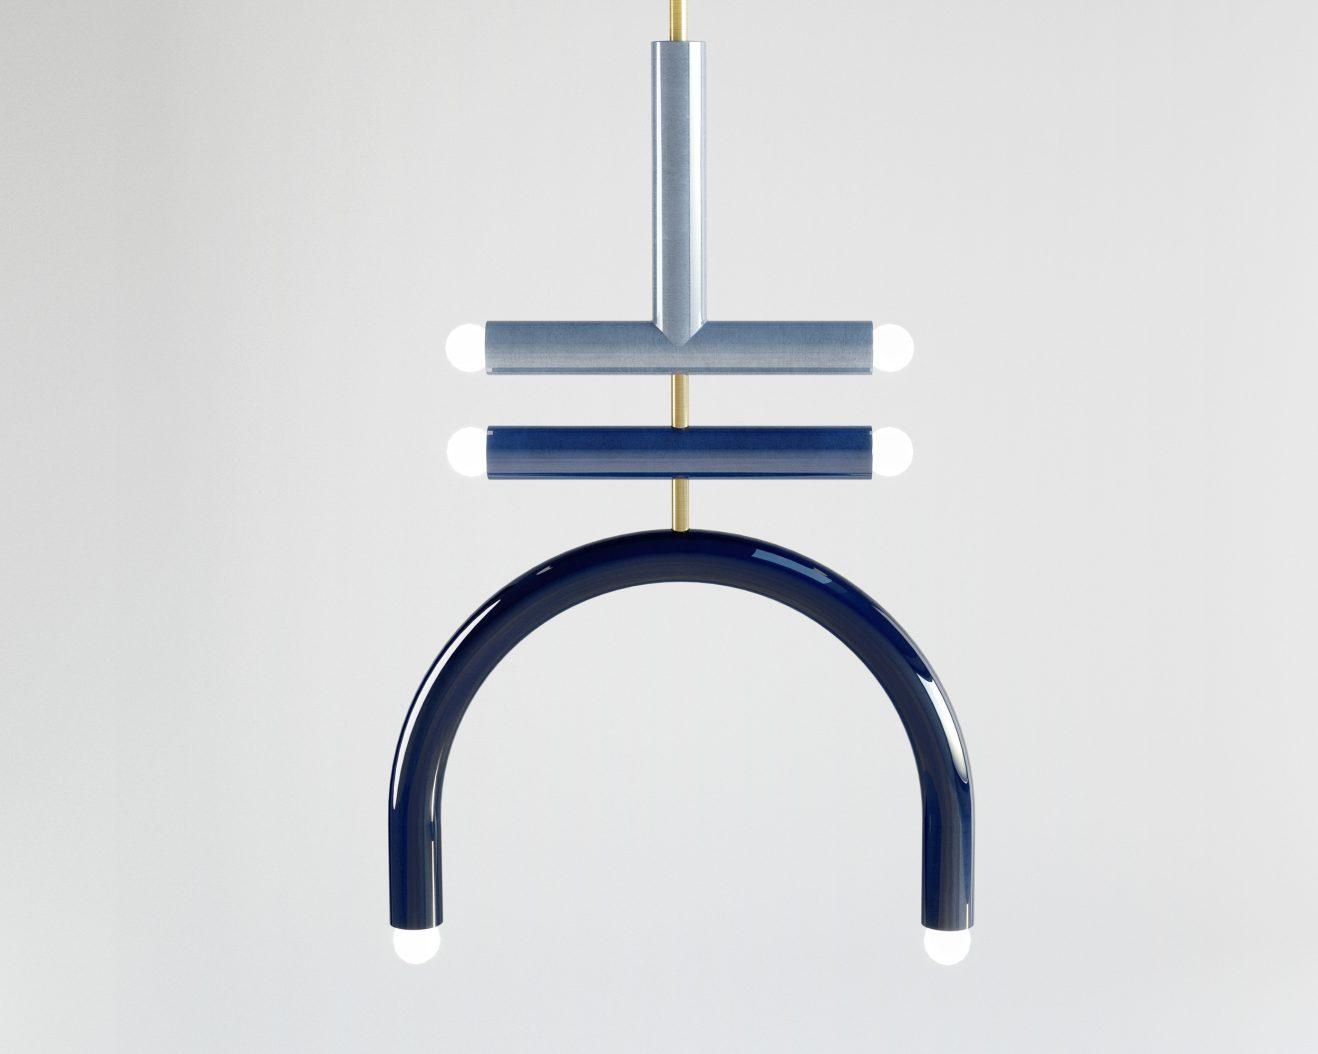 Pani-Jurek-Pendant-Lamp-F2